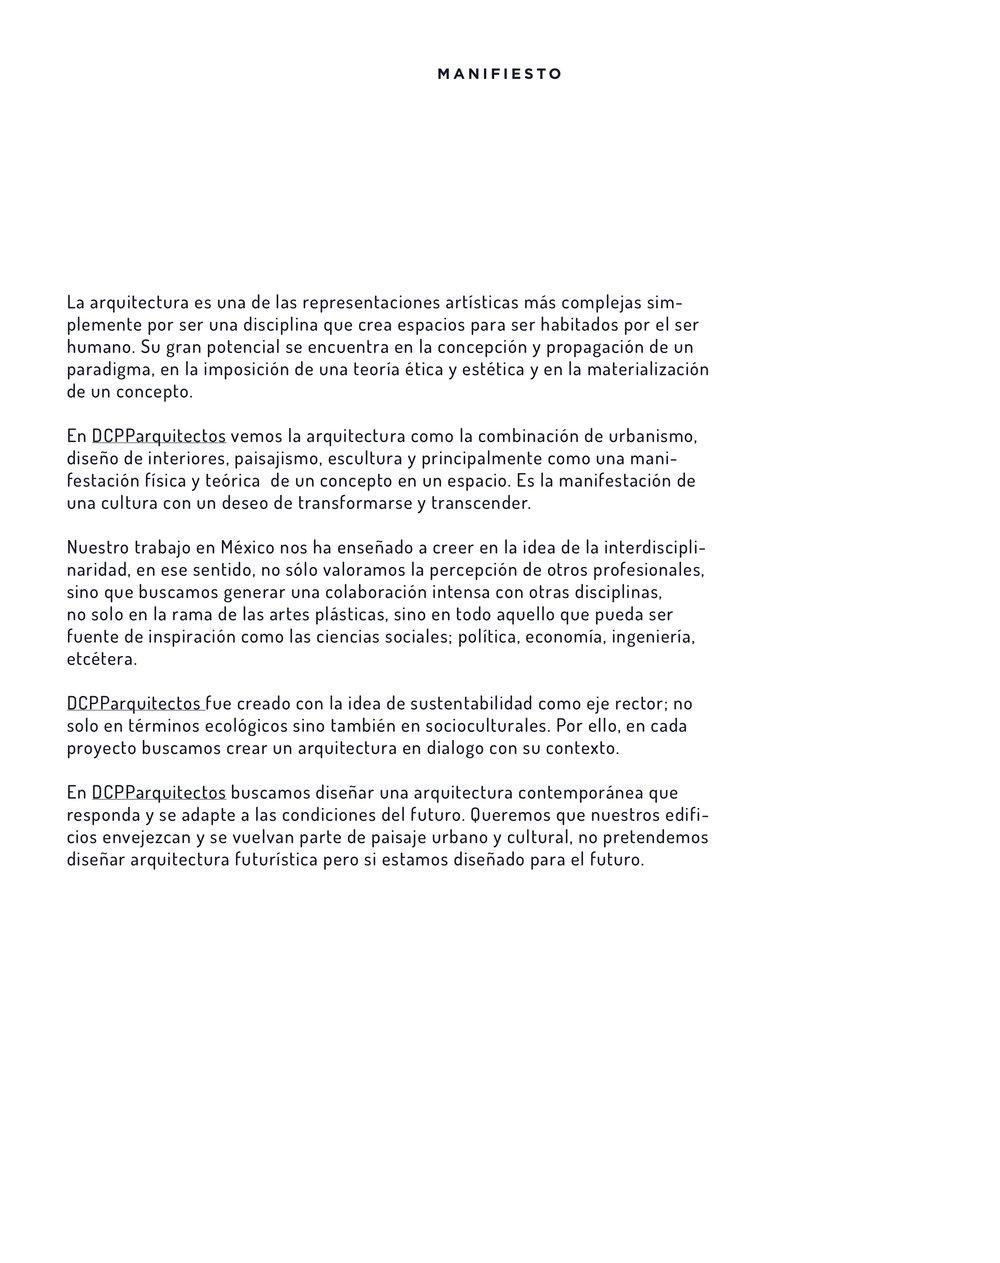 DCPP_propuestafinal_1_genesis_web.jpg